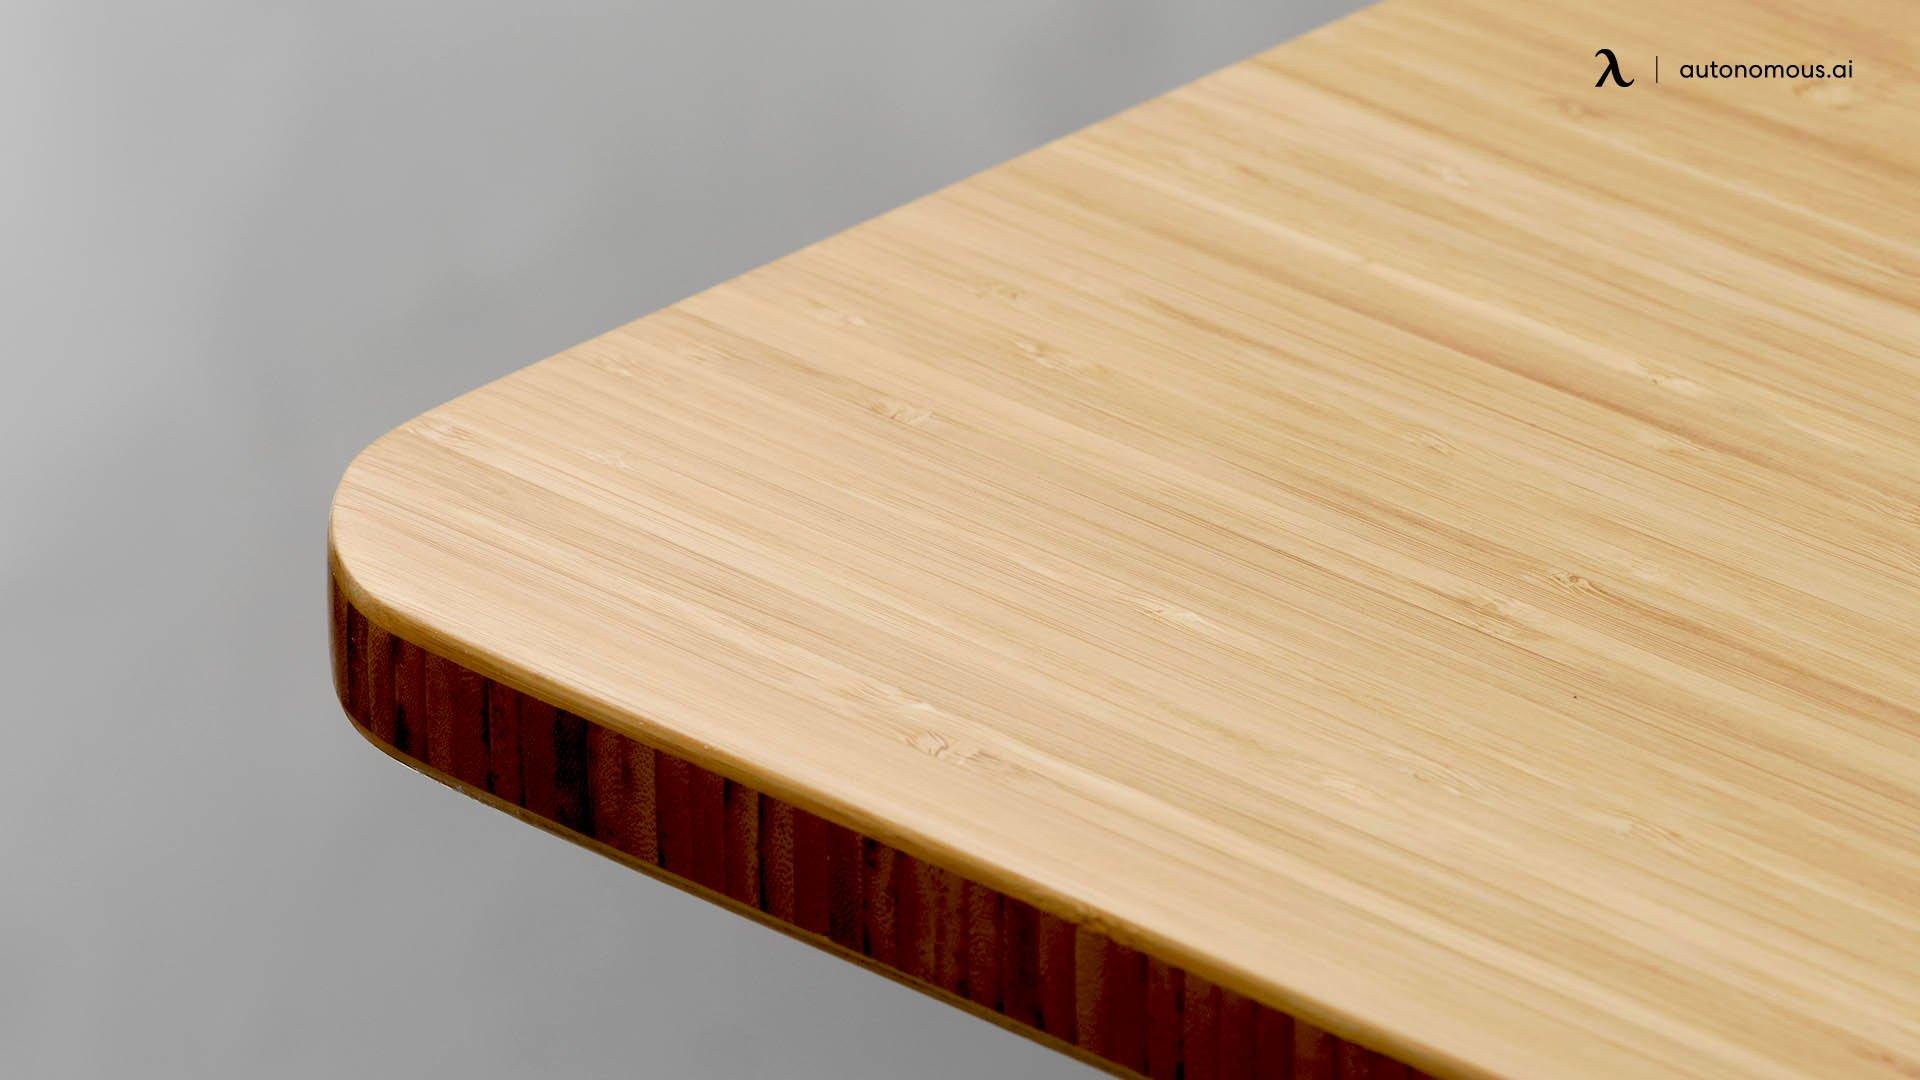 Bamboo Top Standing Desk by Autonomous